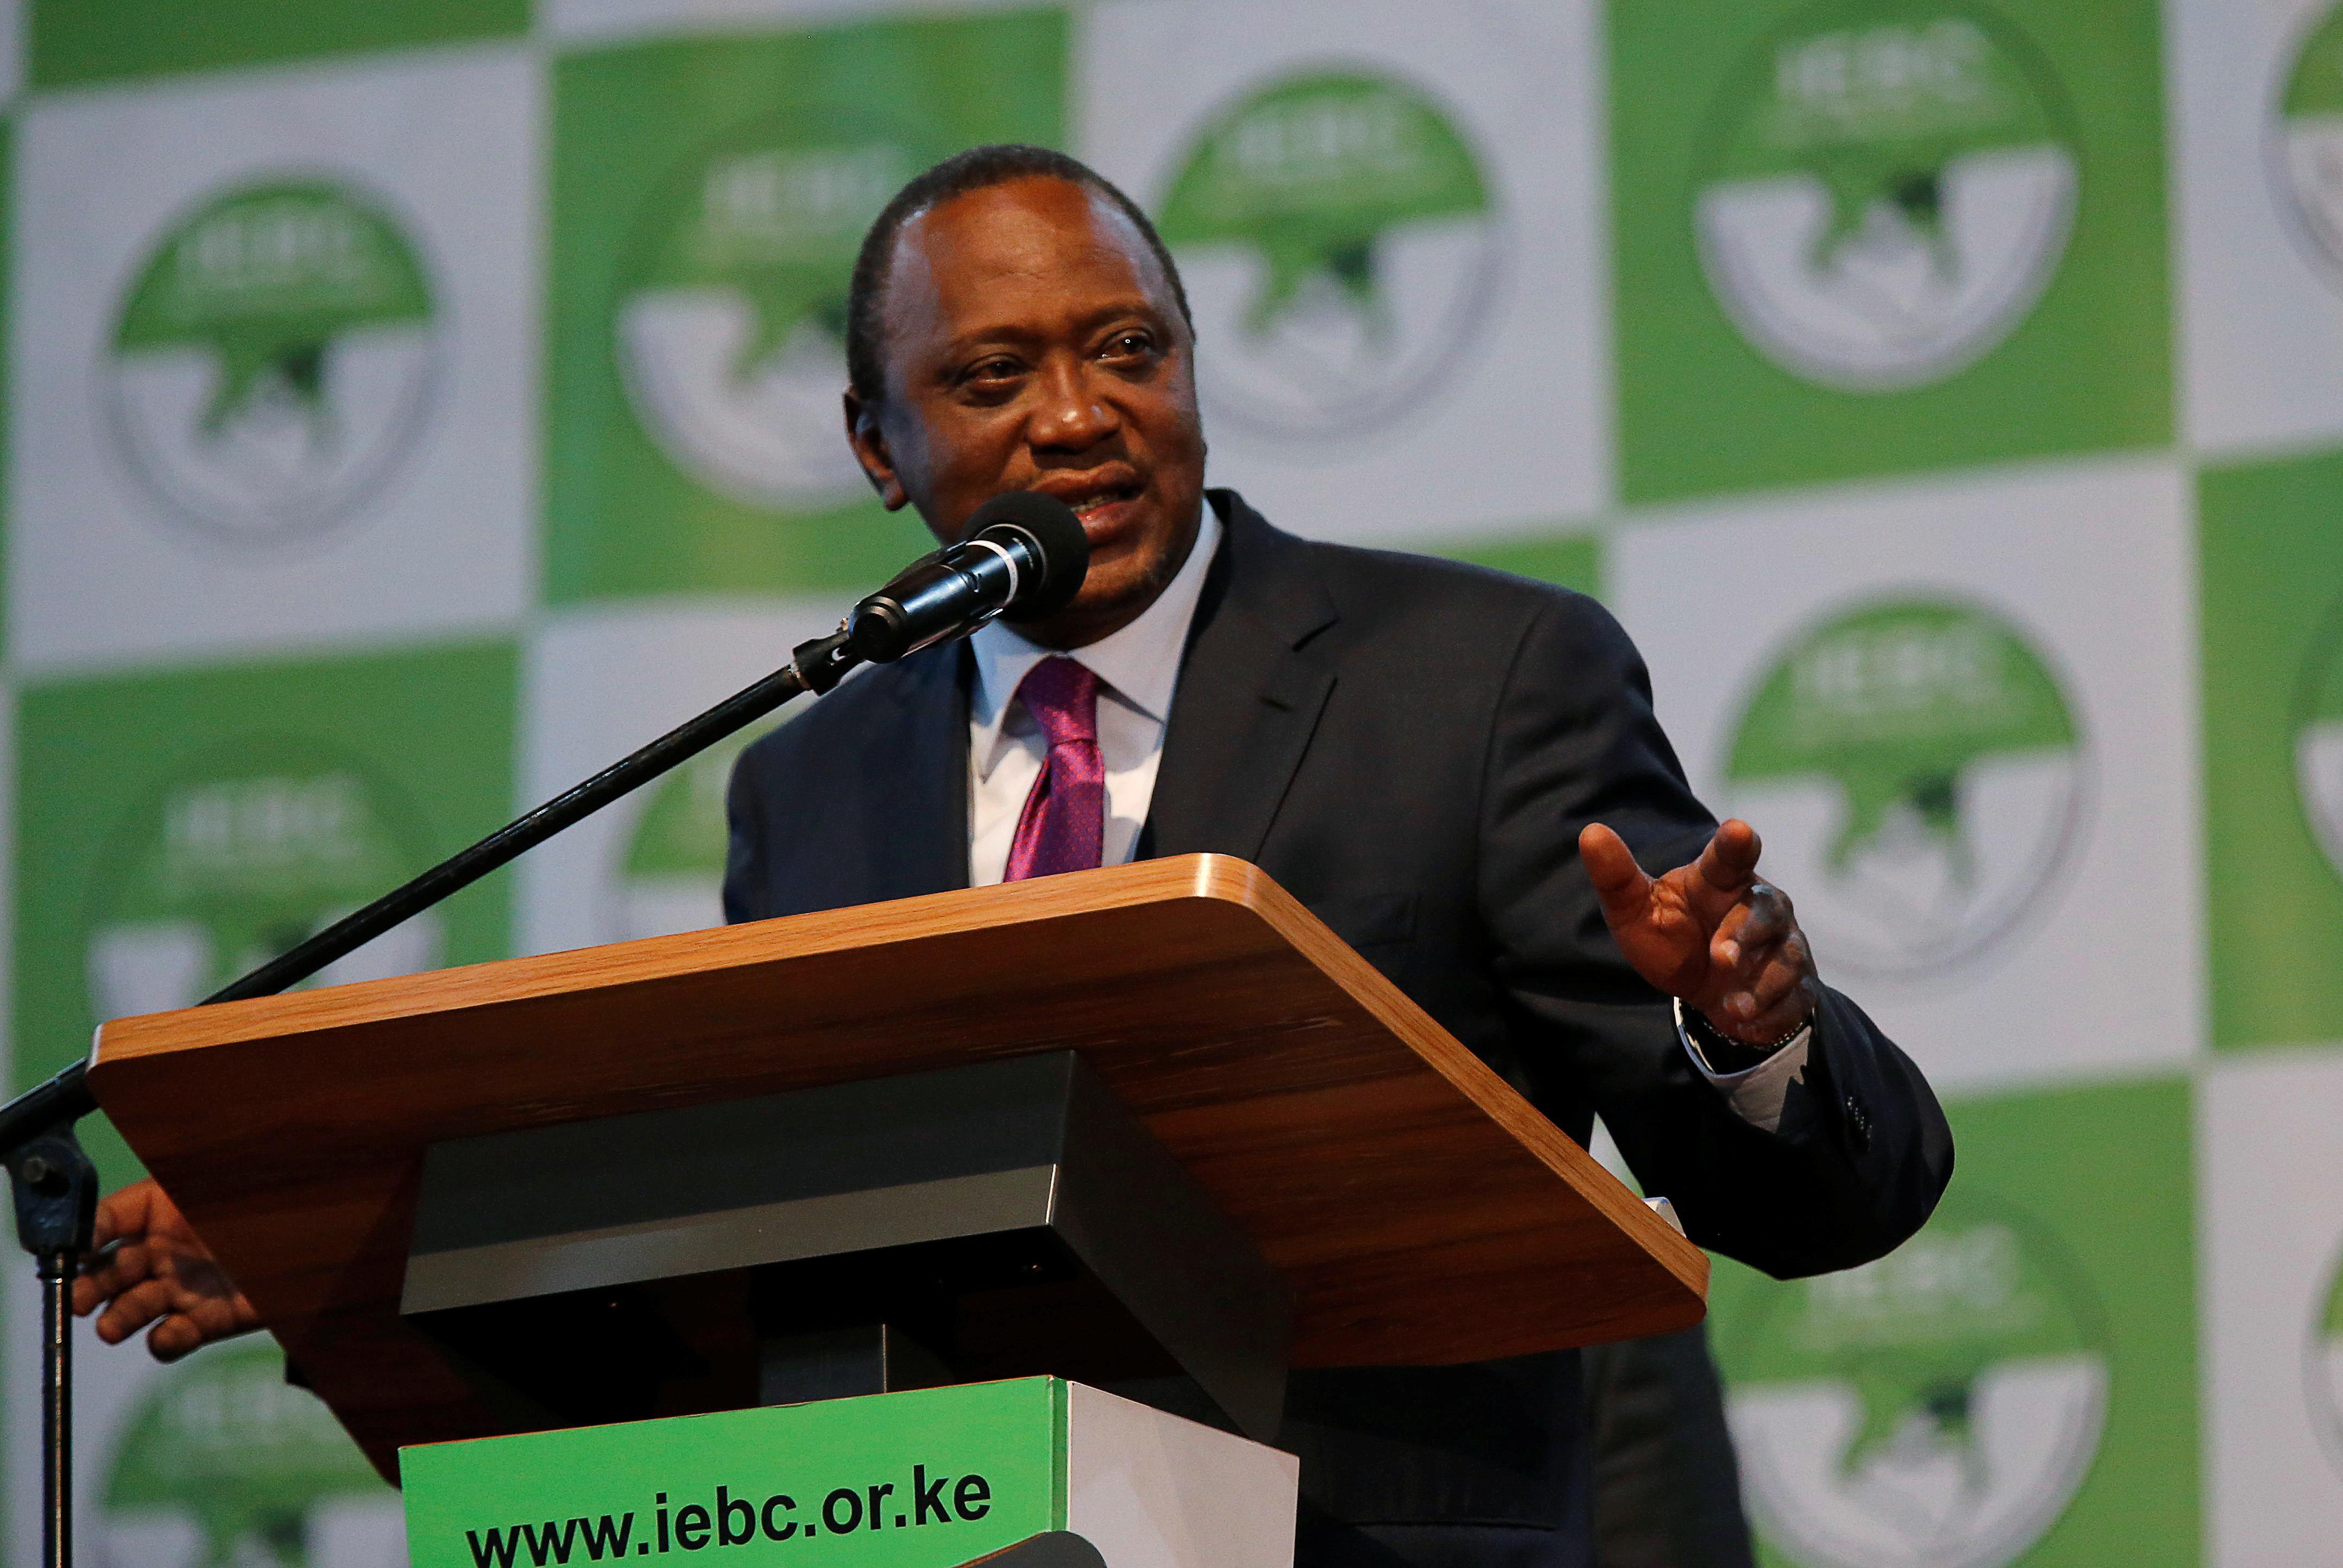 Incumbent President Uhuru Kenyatta speaks after he was announced winner of the presidential election at the IEBC National Tallying centre at the Bomas of Kenya, in Nairobi, Kenya August 11, 2017. REUTERS/Thomas Mukoya